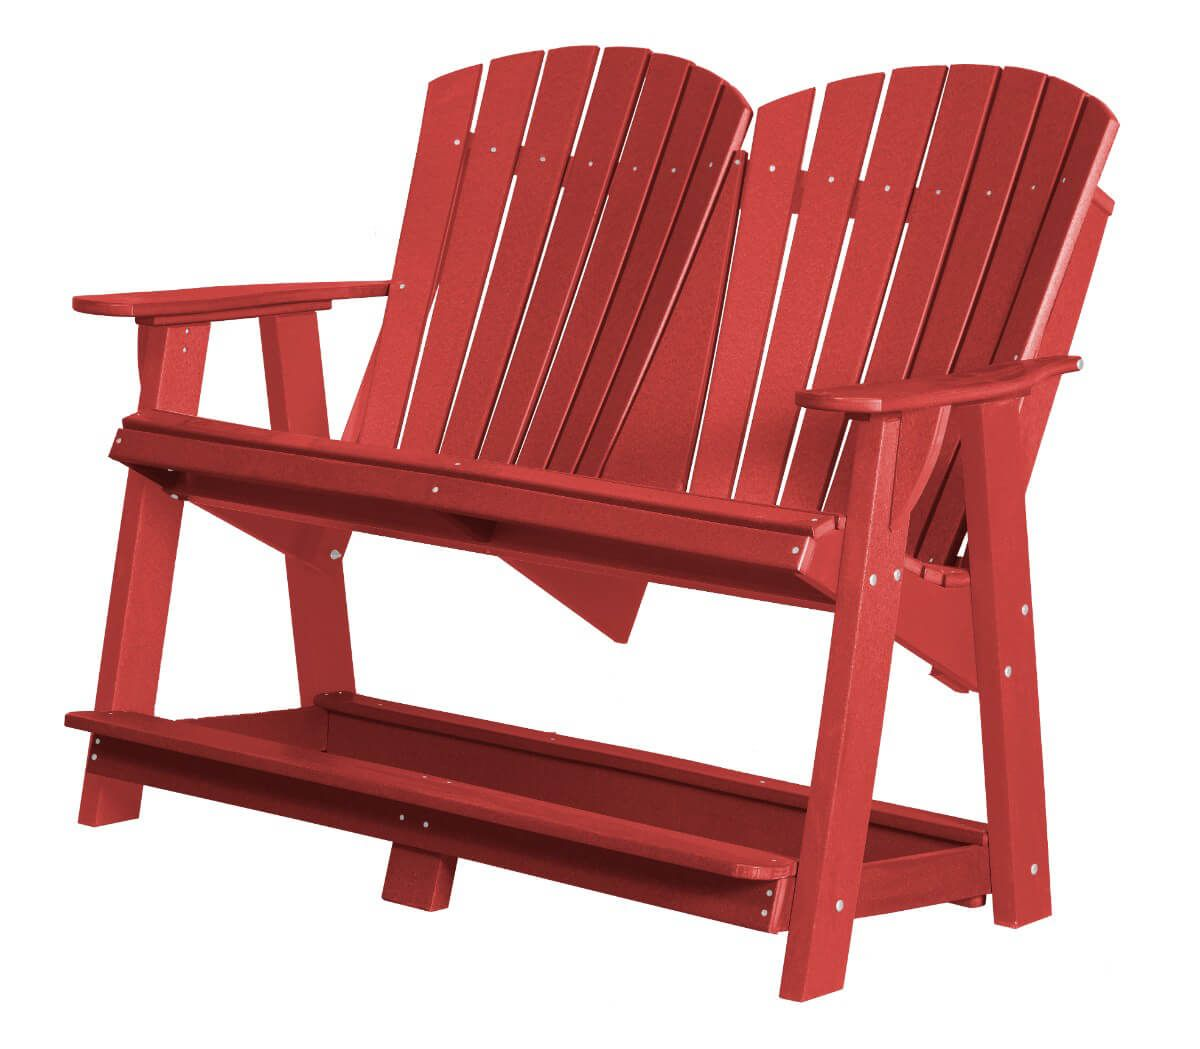 Cardinal Red Sidra Double High Adirondack